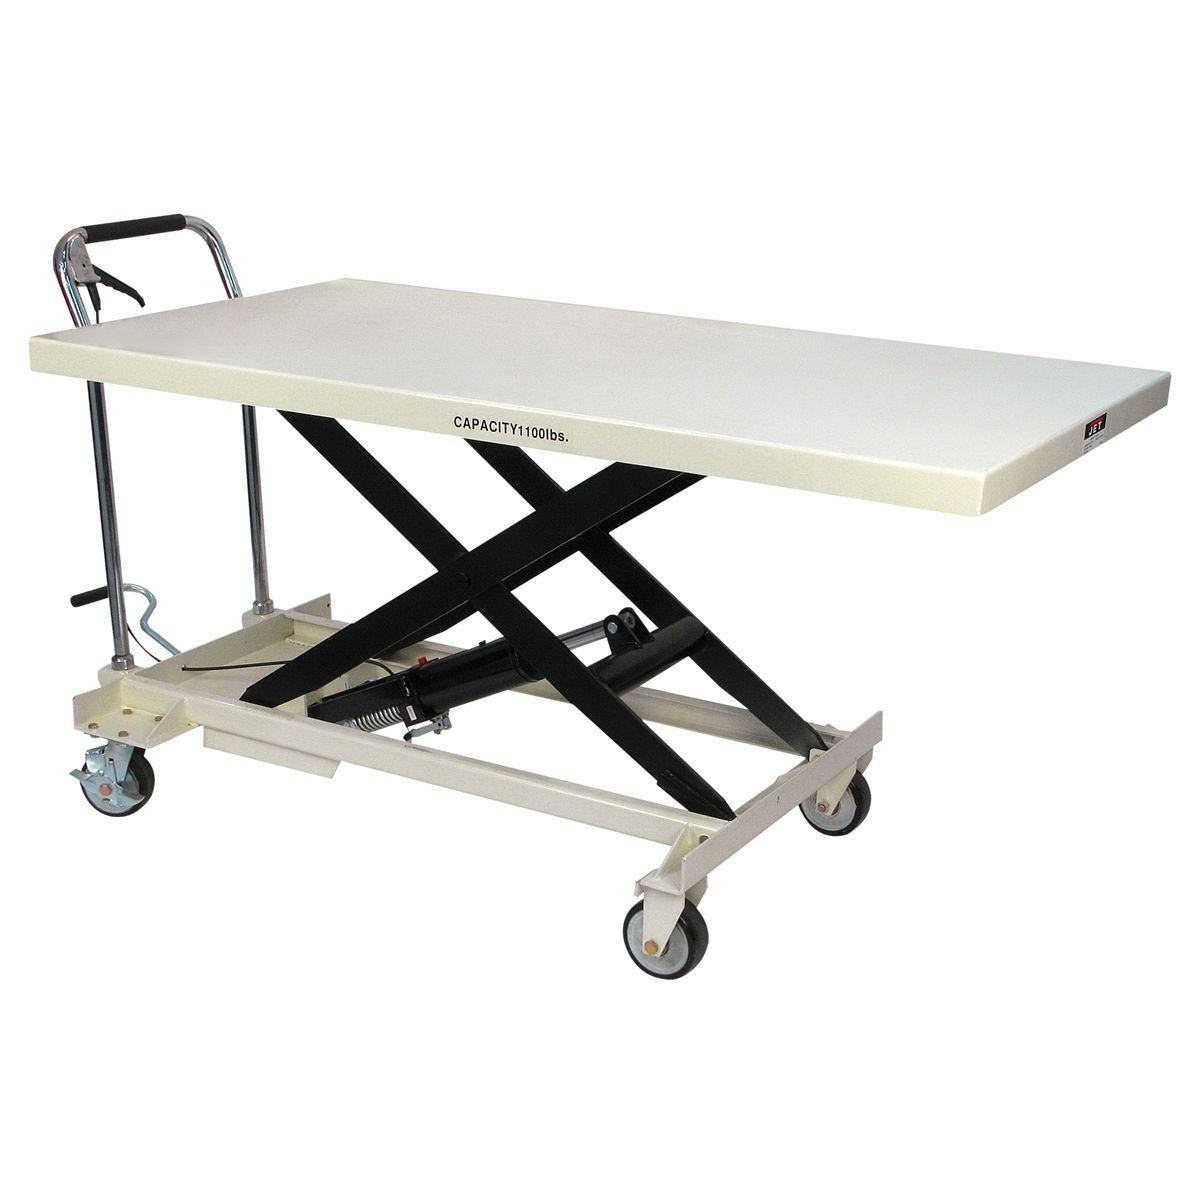 Slt 1100 Jumbo Scissor Lift Table Jet 140780